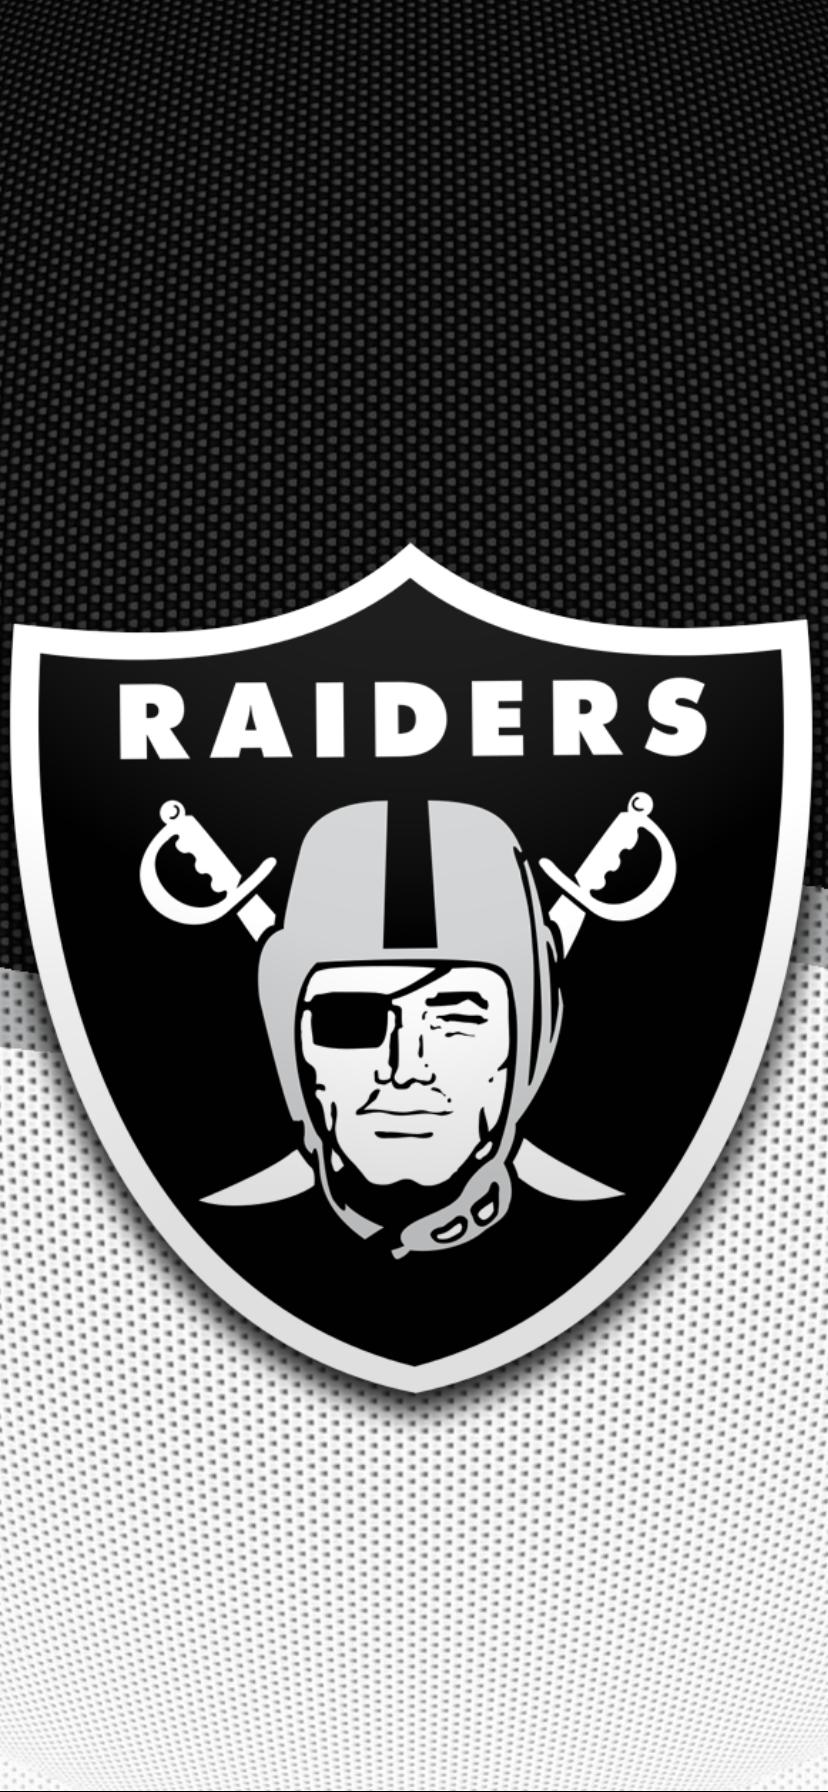 Pin By The David Arroyo On Raider Nation Sport Team Logos Raiders Team Logo